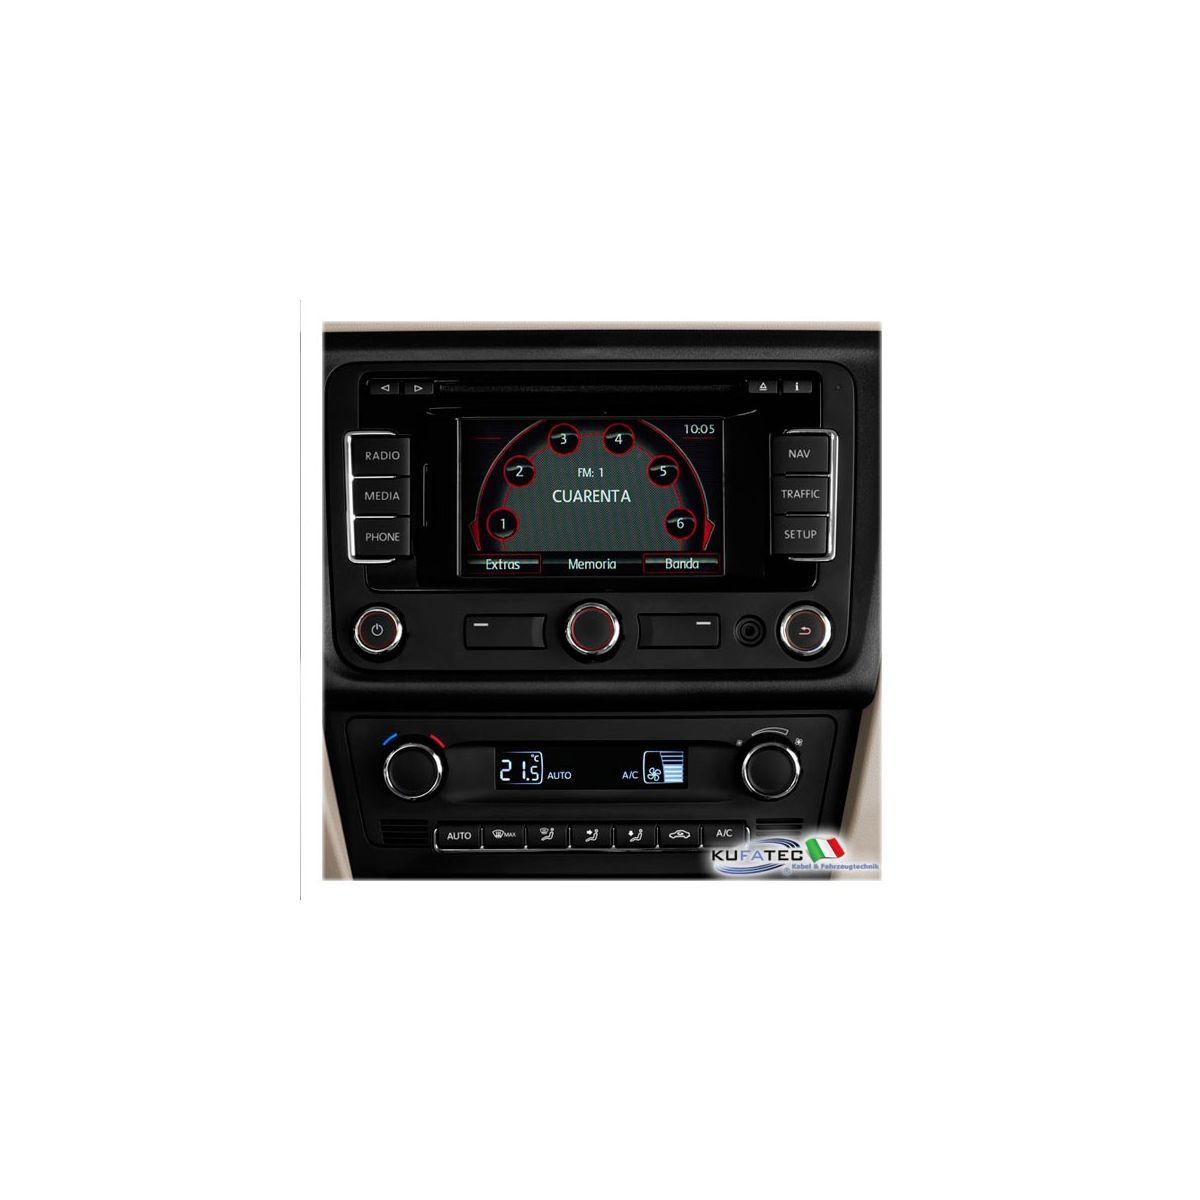 radio navigation seat media system 2 1 display touch 5. Black Bedroom Furniture Sets. Home Design Ideas